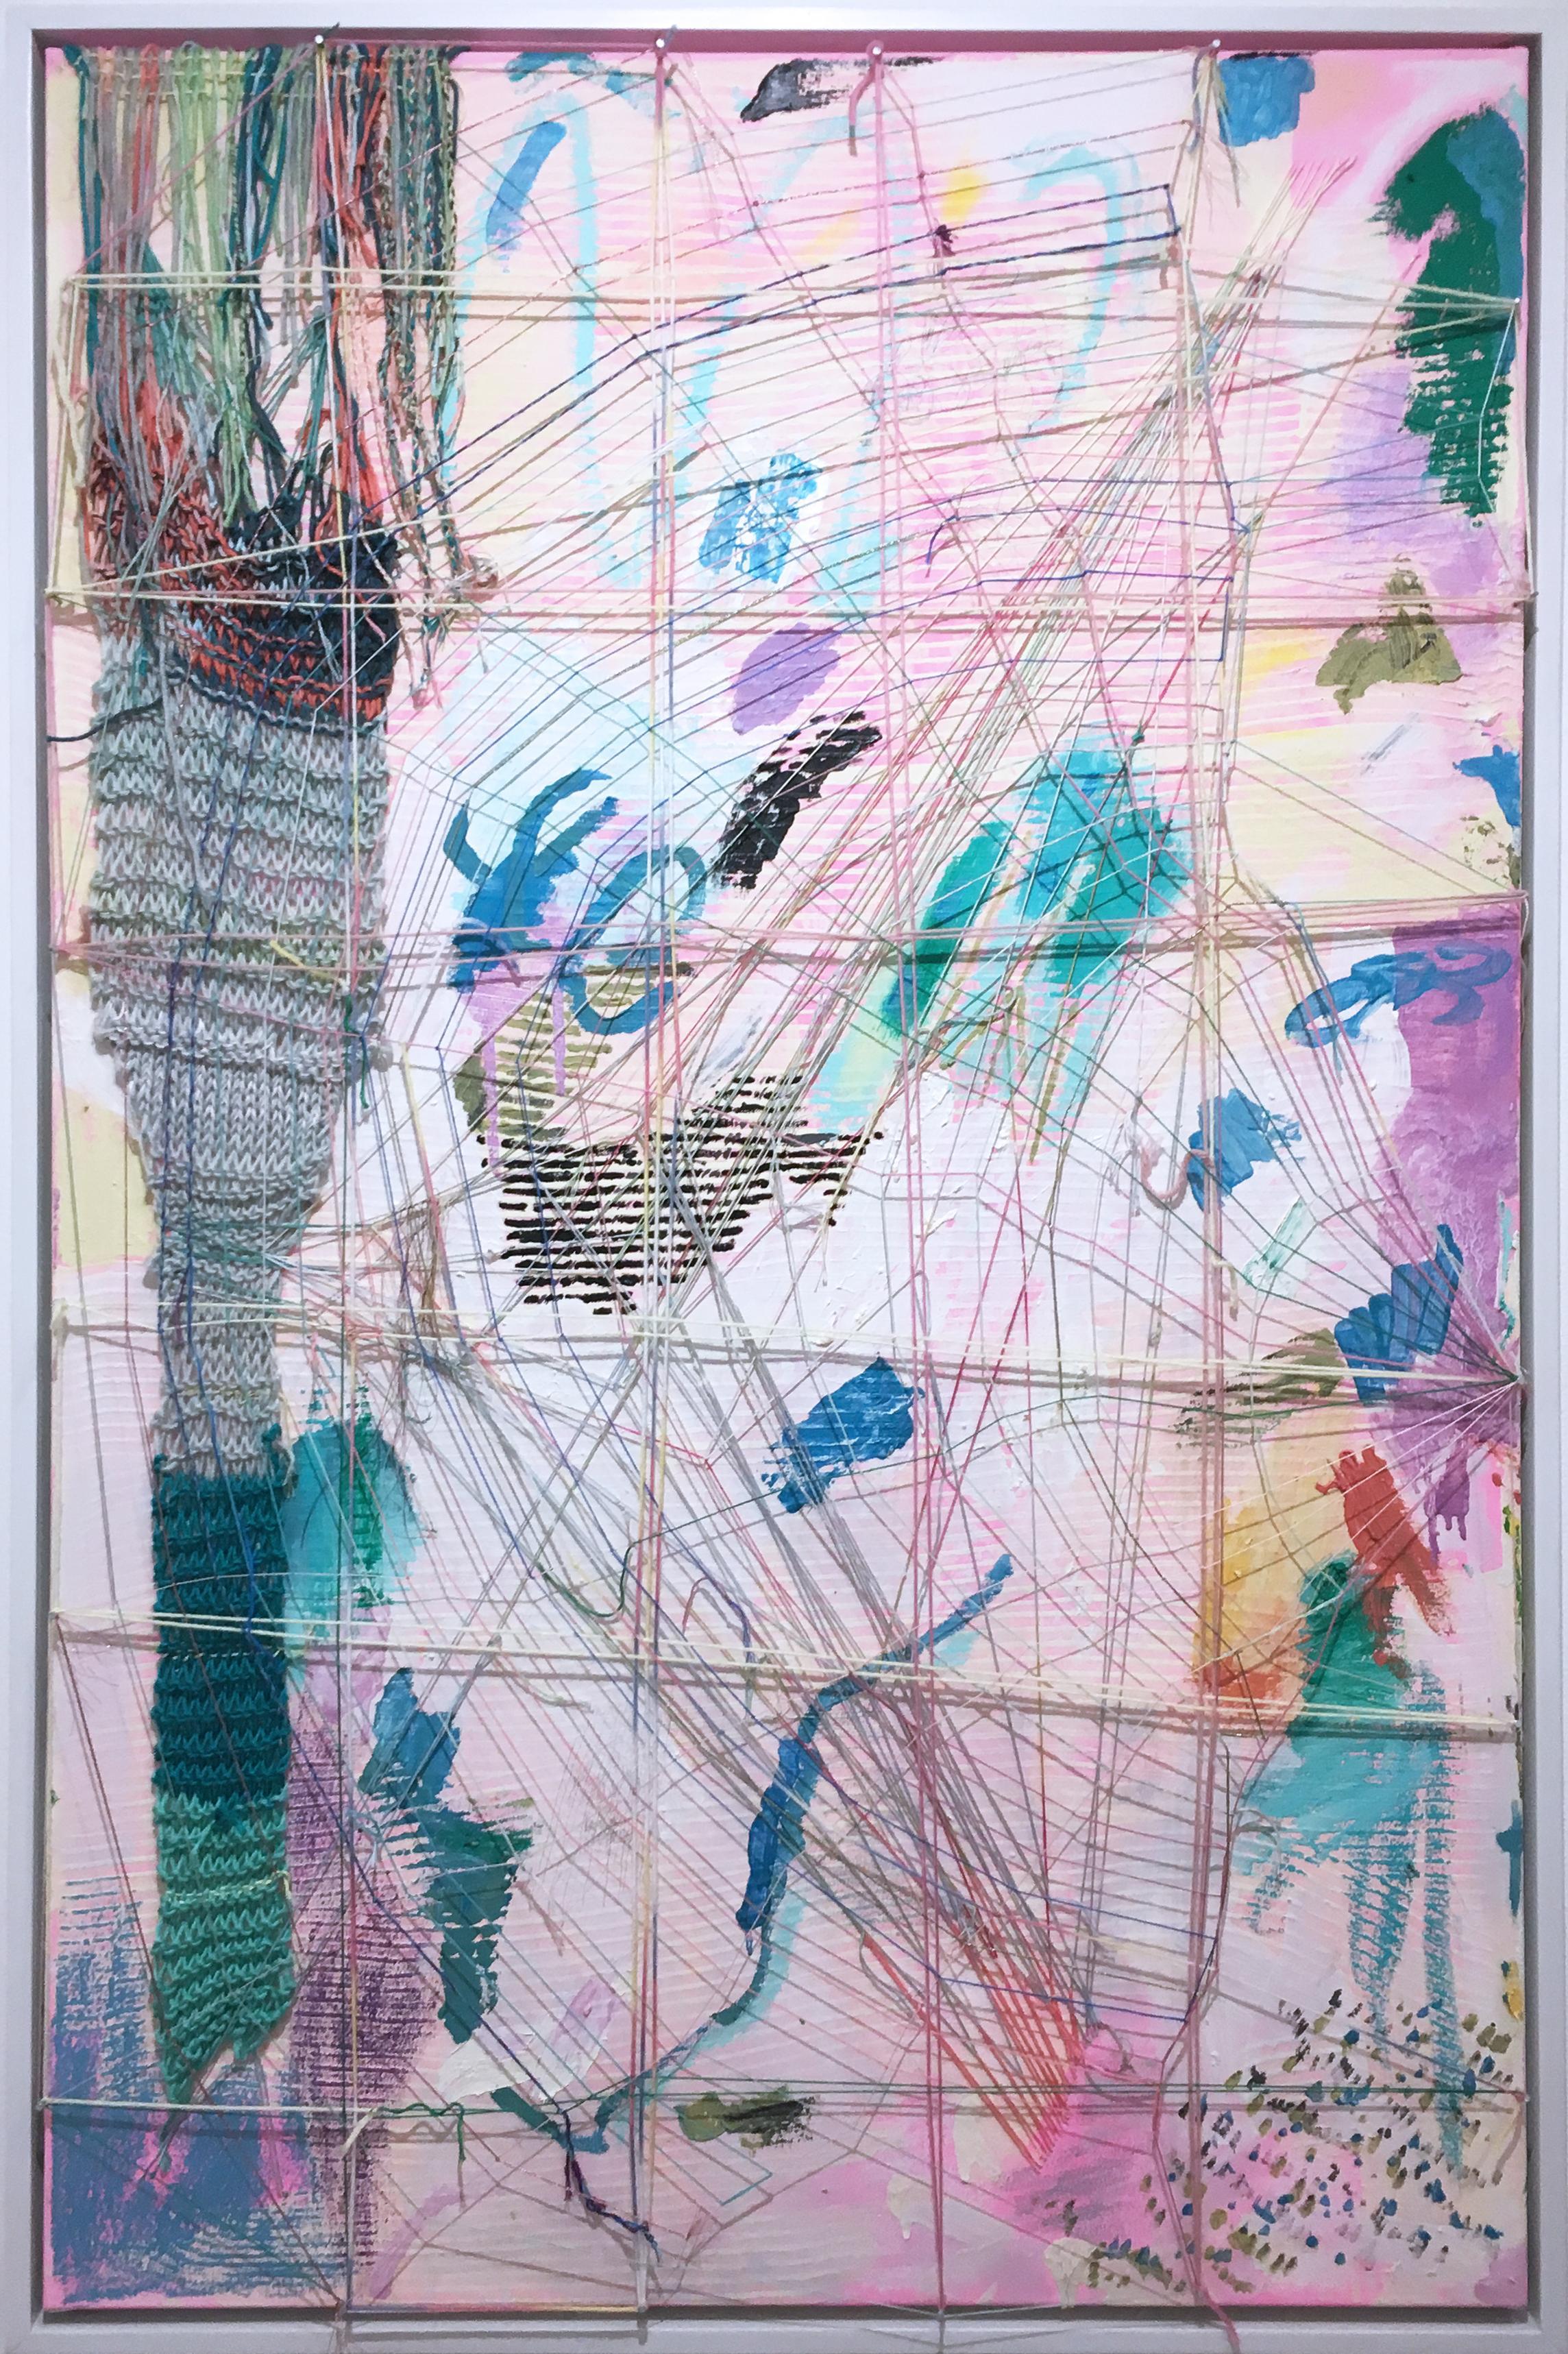 Half Web in Pink, 2020, acrylic, oil, canvas, yarn, thread, pink, abstract